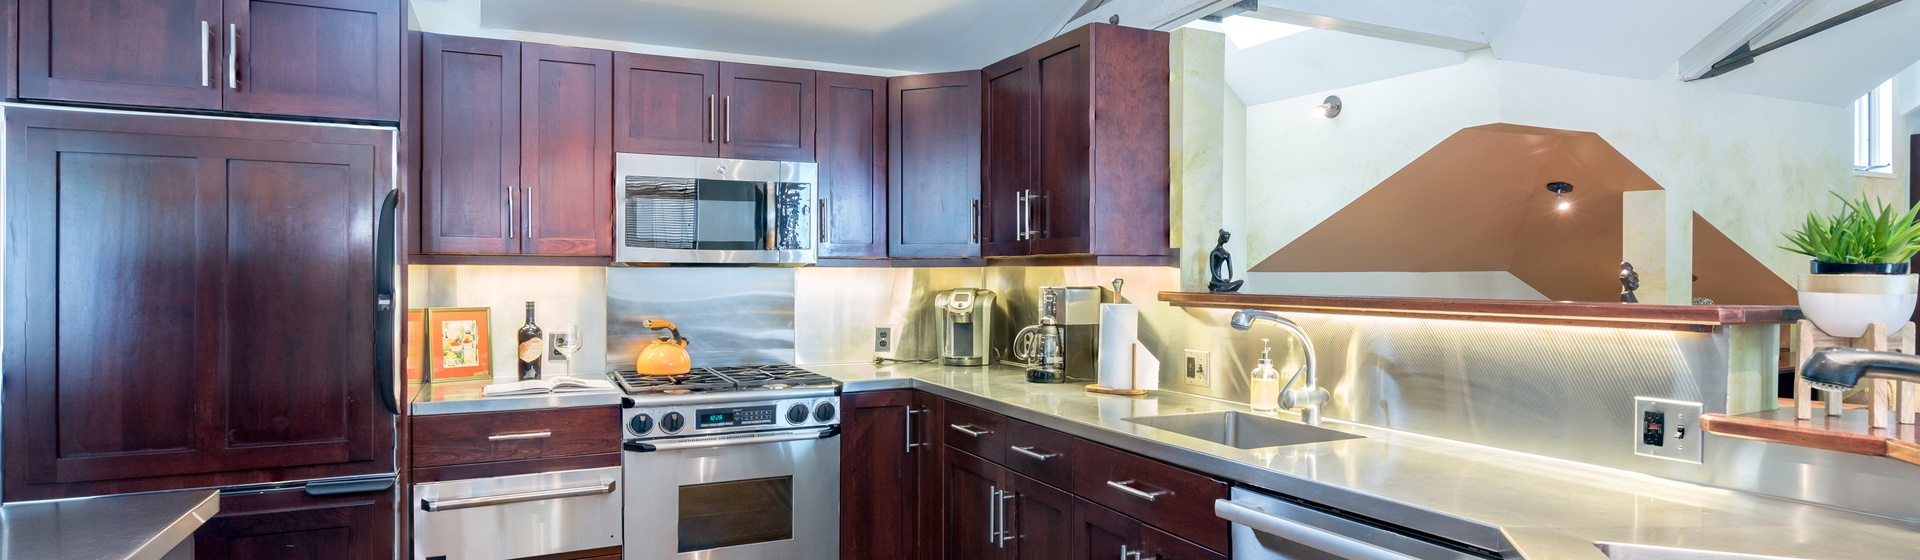 7-Telluride-Ajax-Kitchen-Interior-Web.jpg